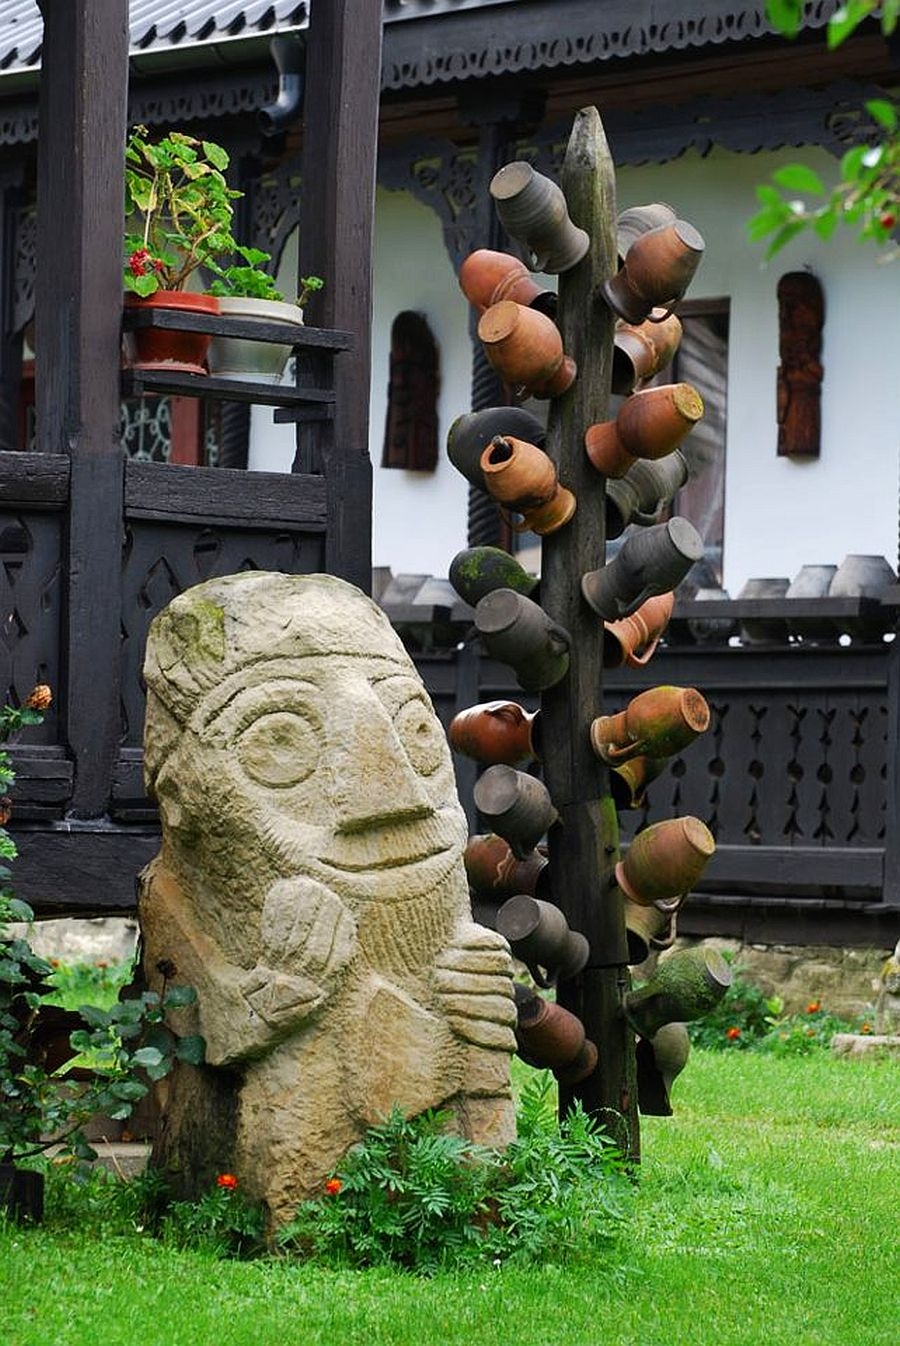 adelaparvu.com despre Muzeul Popa, Tarpesti, judetul Neamt, Romania, text Molnia Efremov (7)